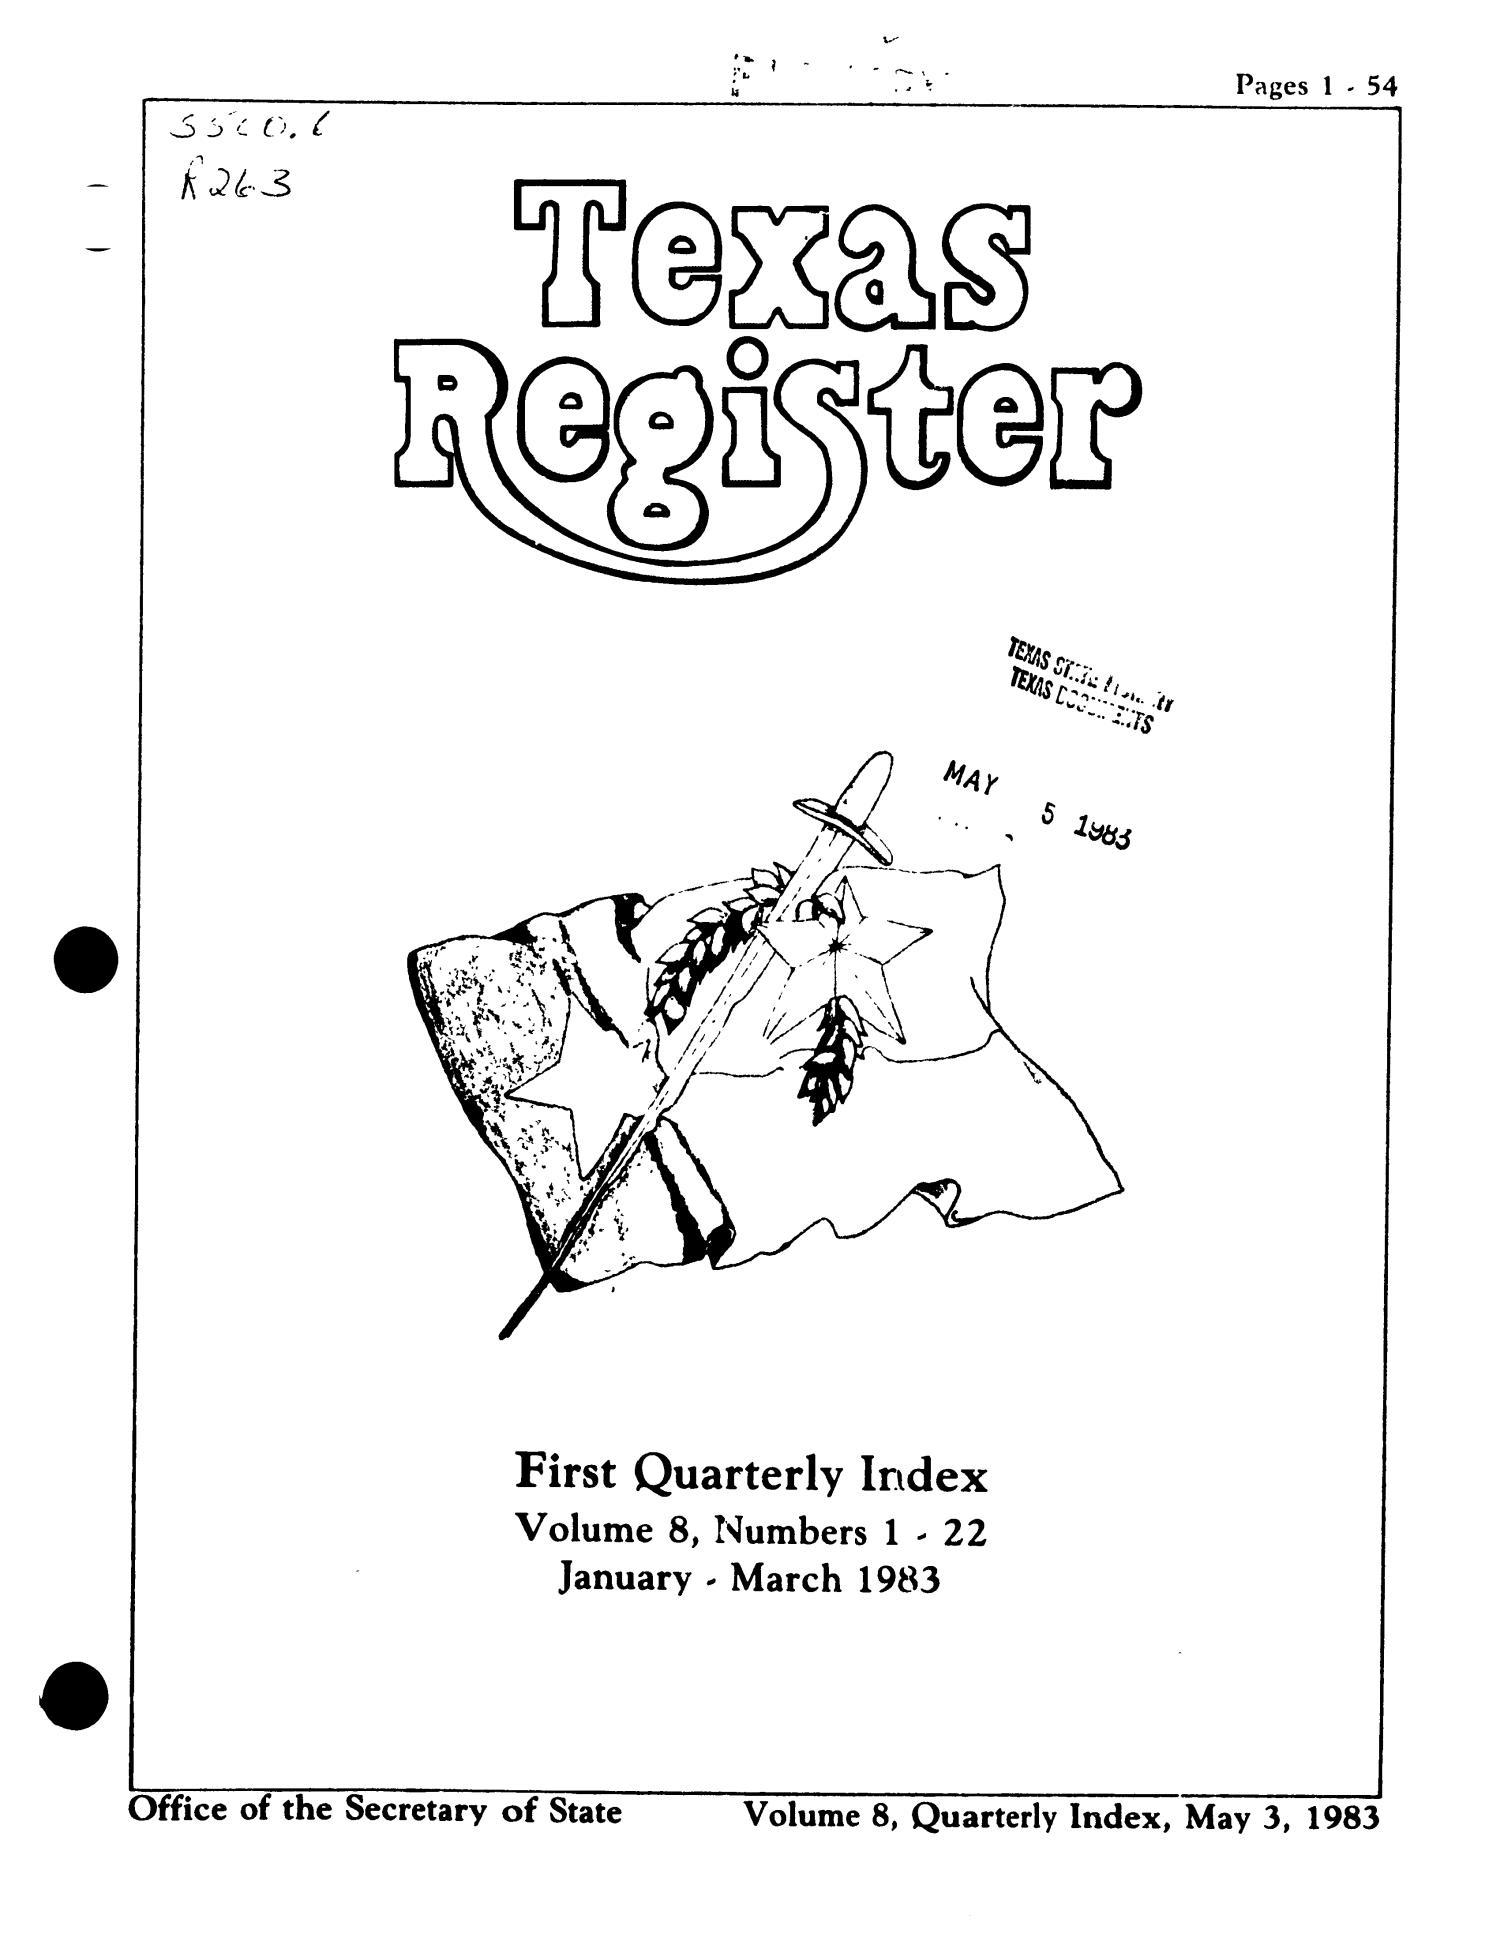 Texas Register, Volume 8, Quarterly Index I Numbers 1-22